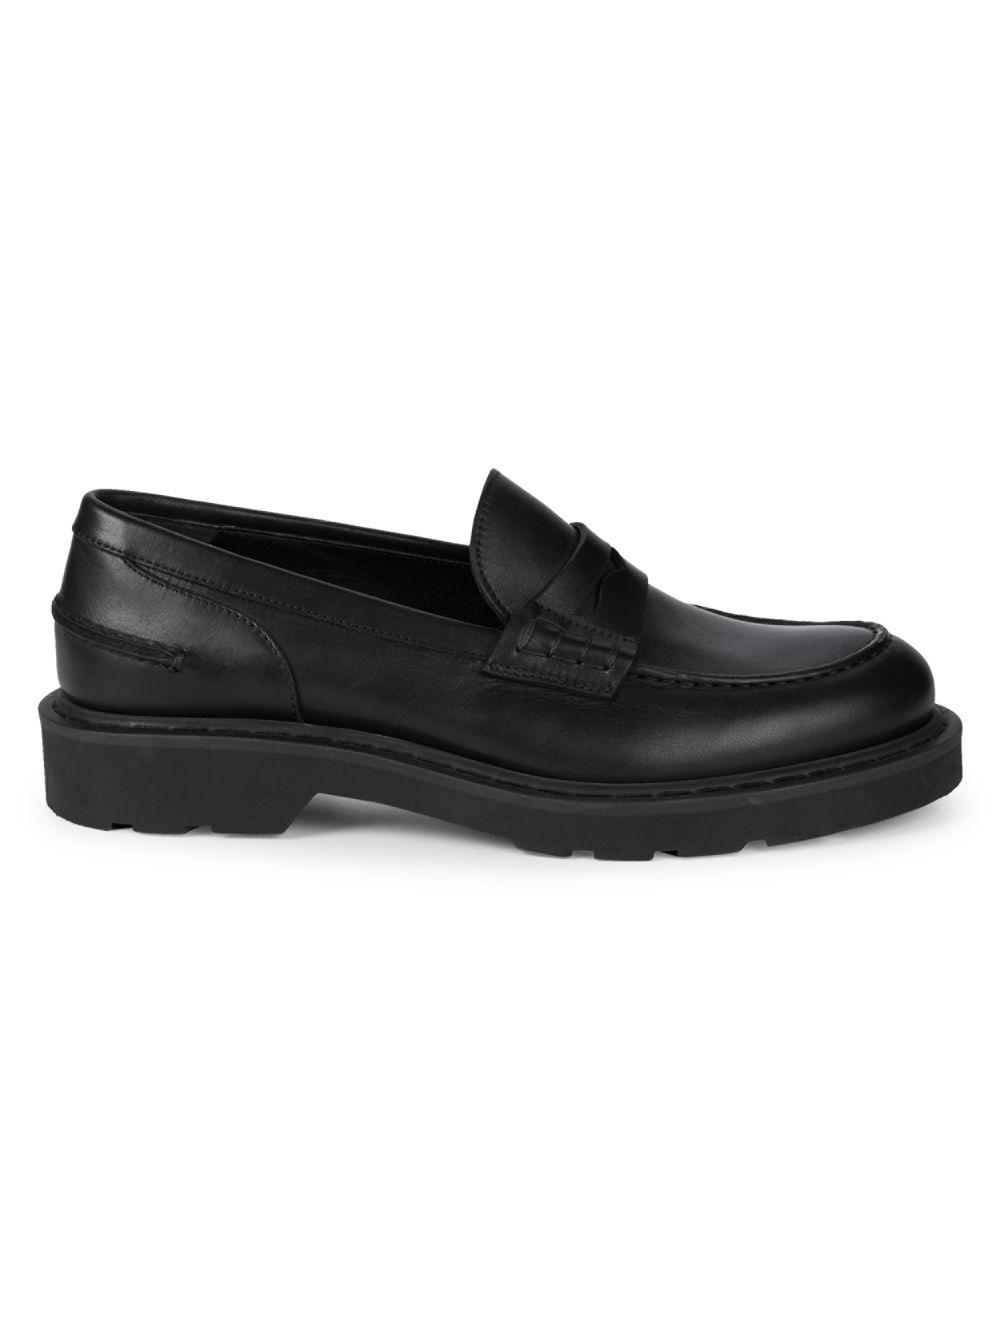 28392760ddf4b Lyst - Alexander McQueen Treaded Leather Loafers in Black for Men